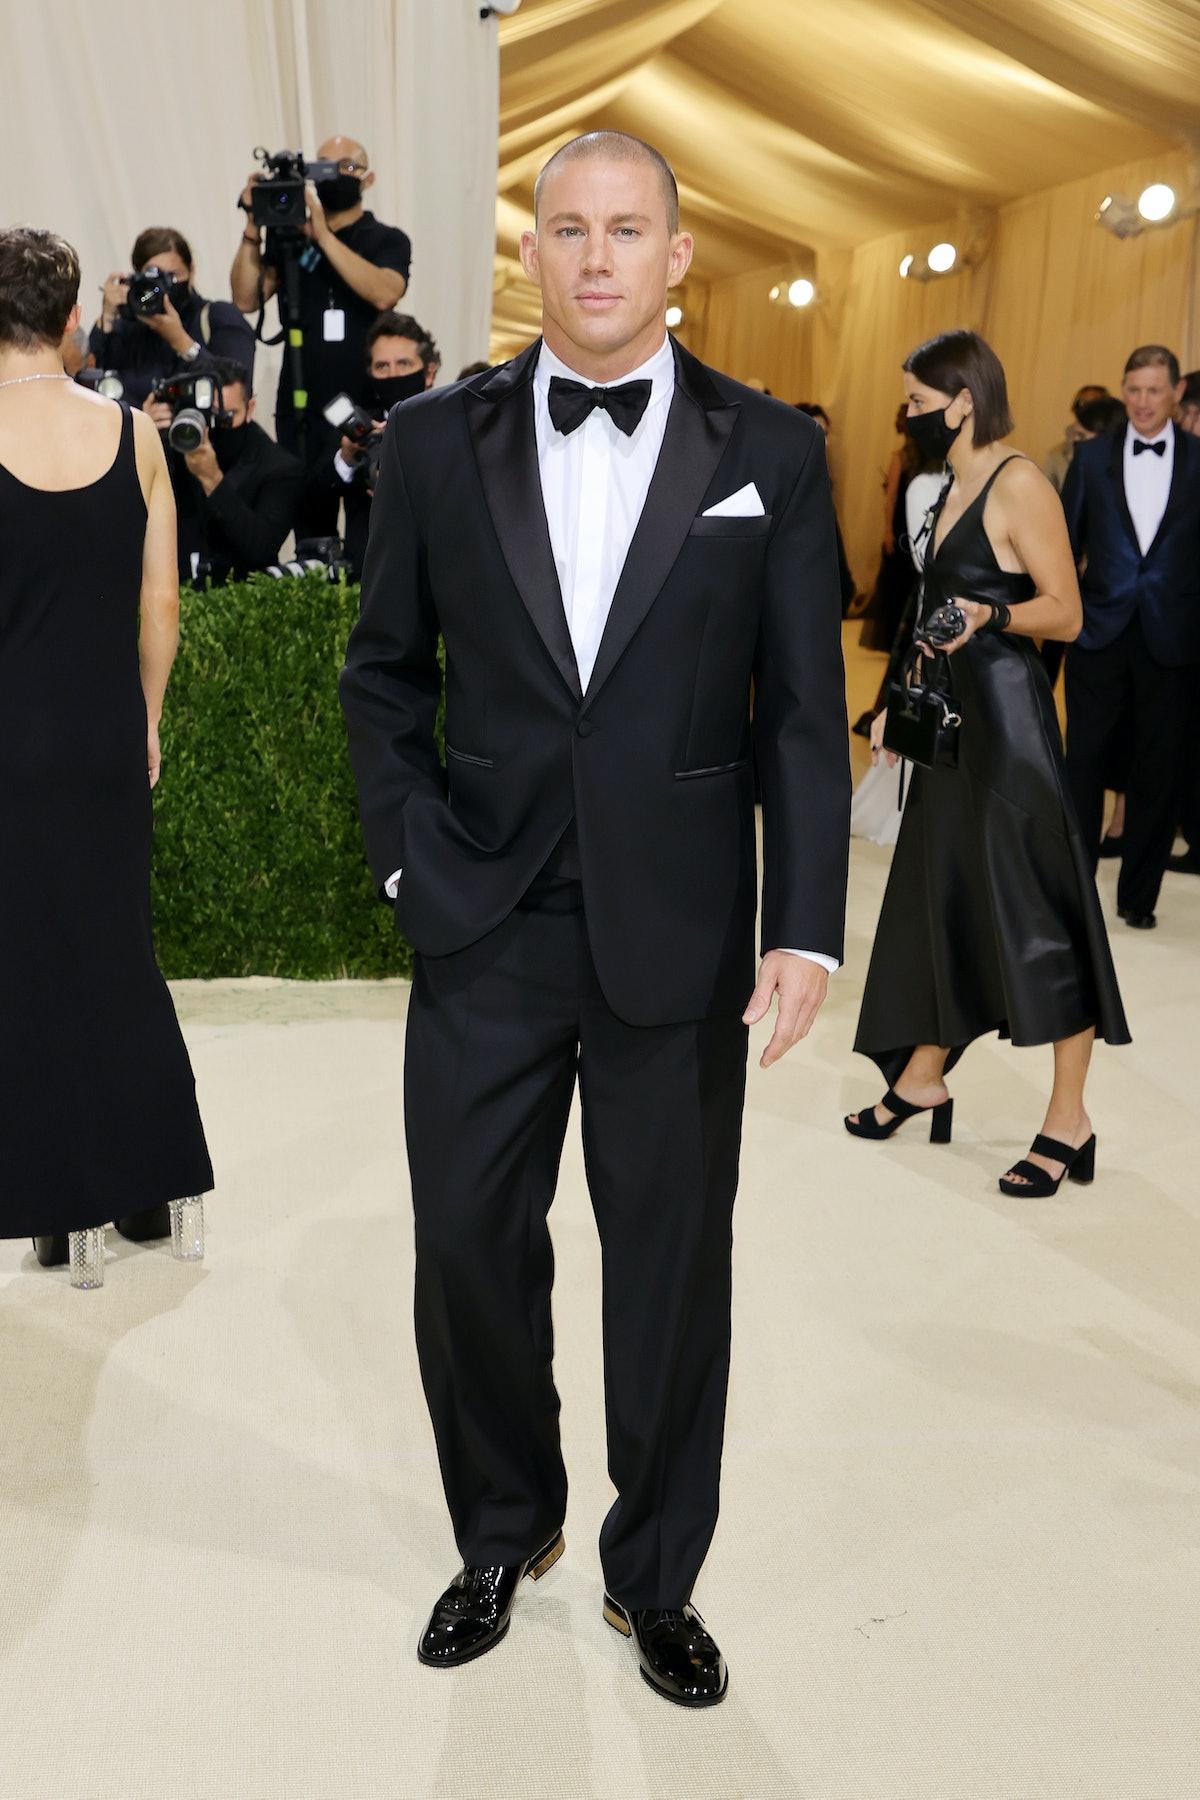 NEW YORK, NEW YORK - SEPTEMBER 13: Channing Tatum attends The 2021 Met Gala Celebrating In America: ...